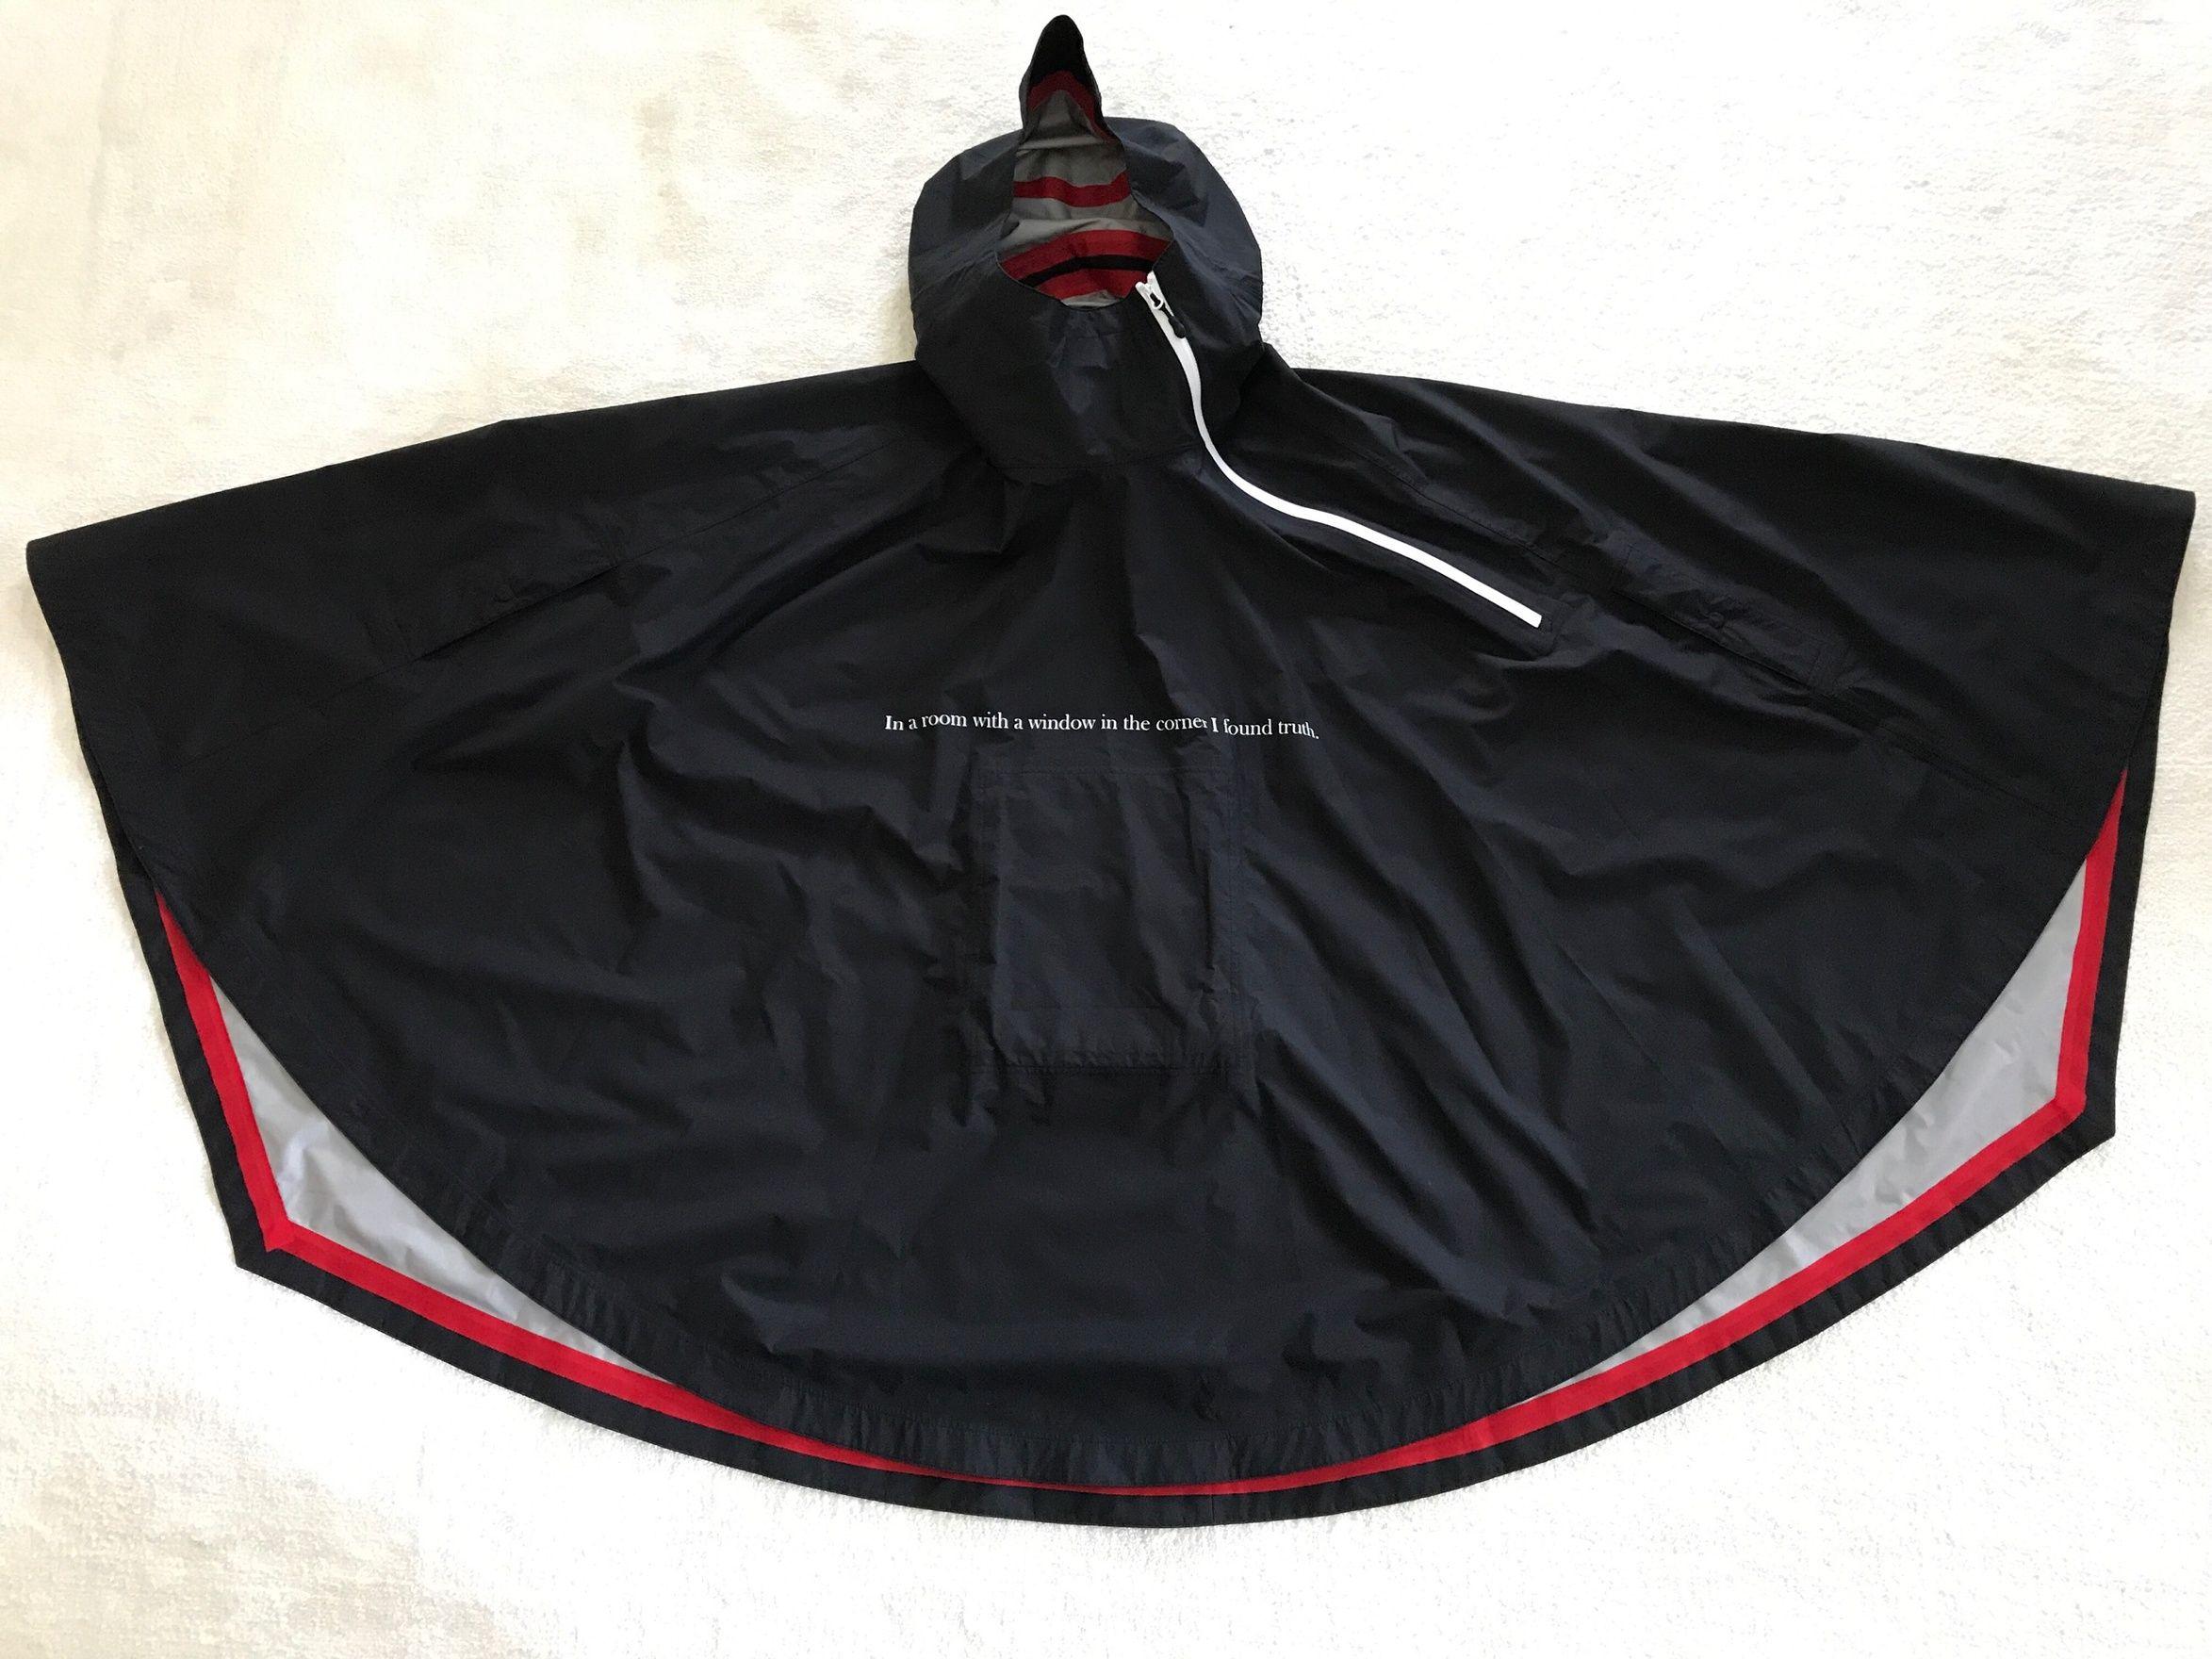 b9690b2f6aa7 Undercover Greatest Cloak Size US L   EU 52-54   3 - 1